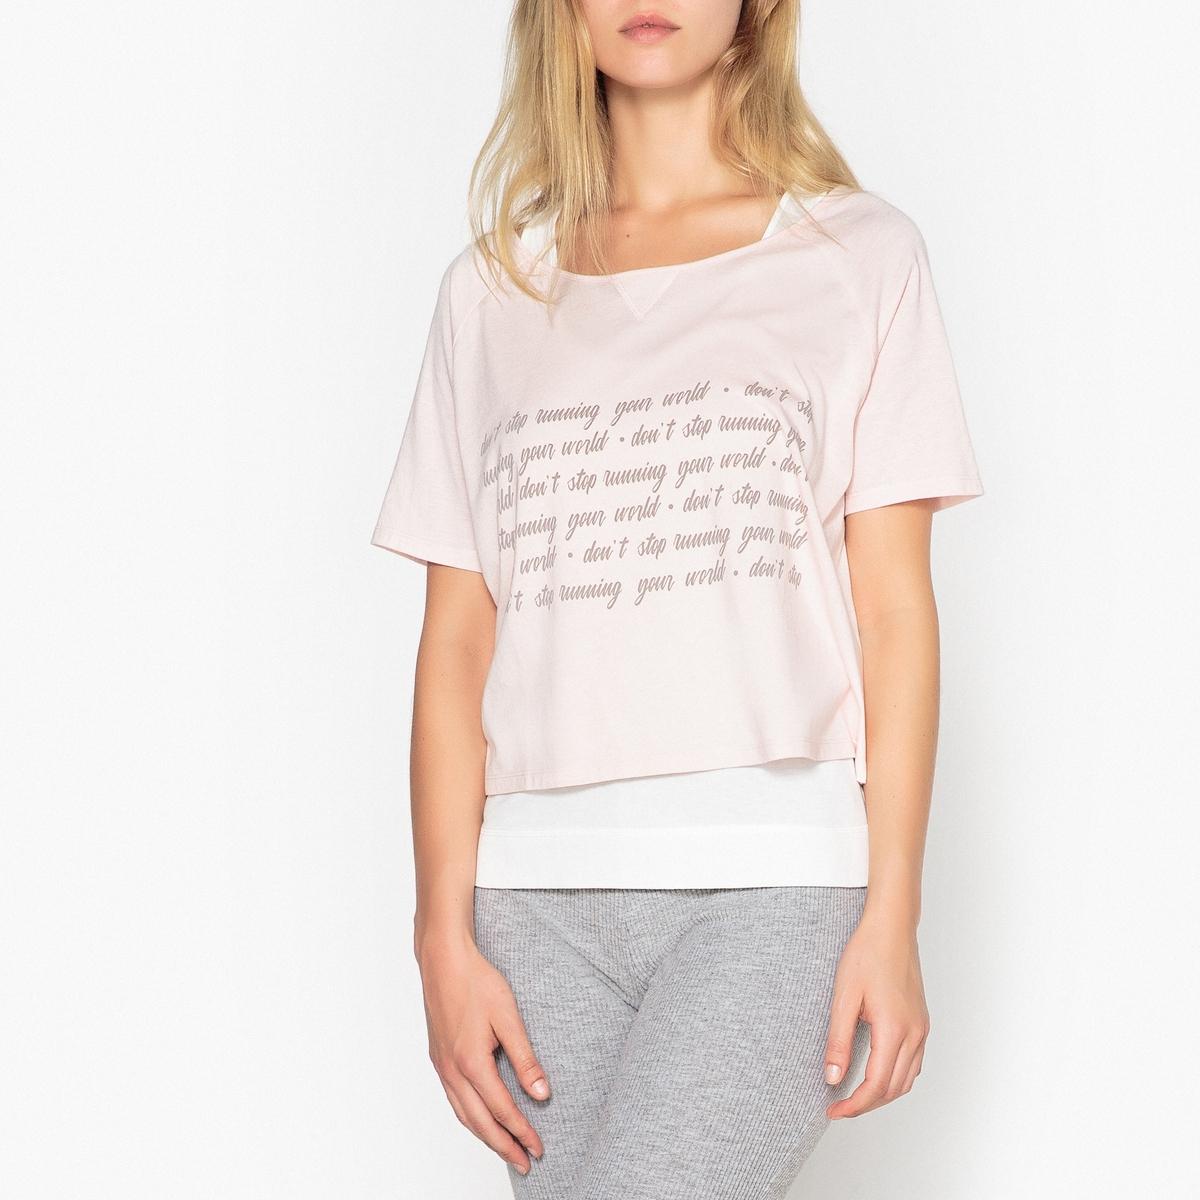 Camisetas de pijama de manga corta, lote de 2